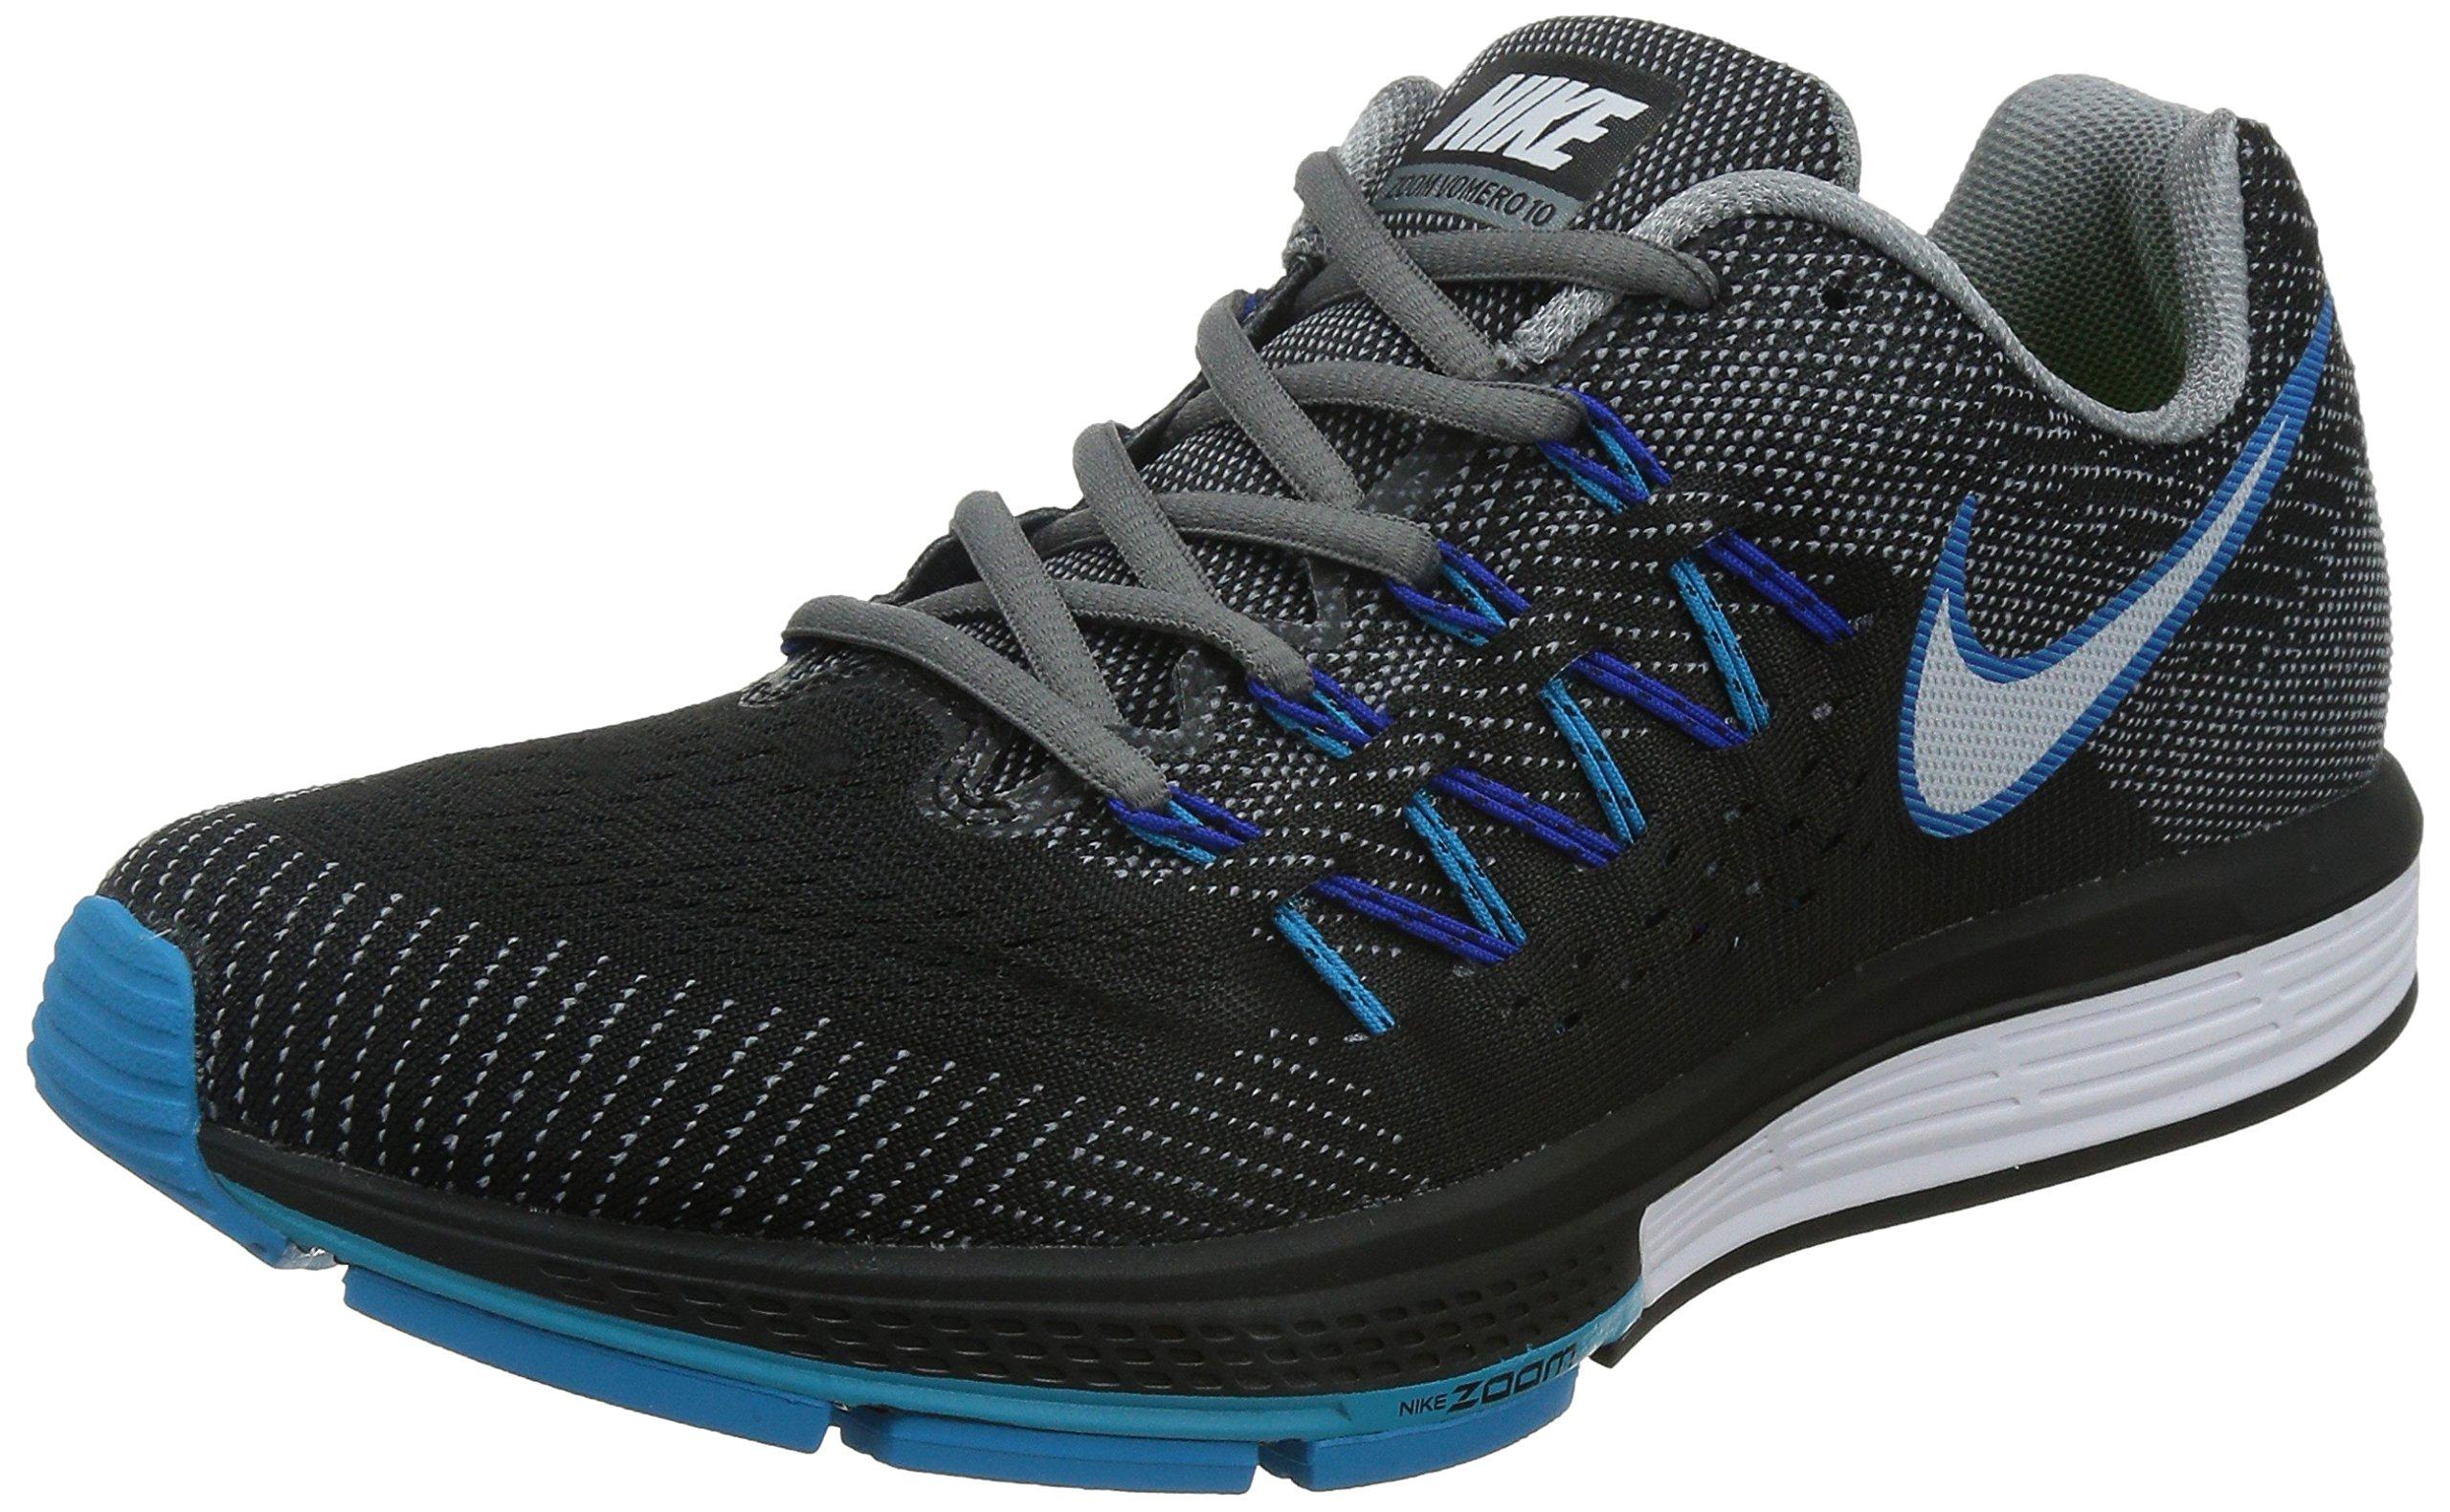 949e350ac2b Galleon - Nike Air Zoom Vomero 10 Mens Running Shoes Cool Grey   White    Black   Bl Lgn 9 D(M) US